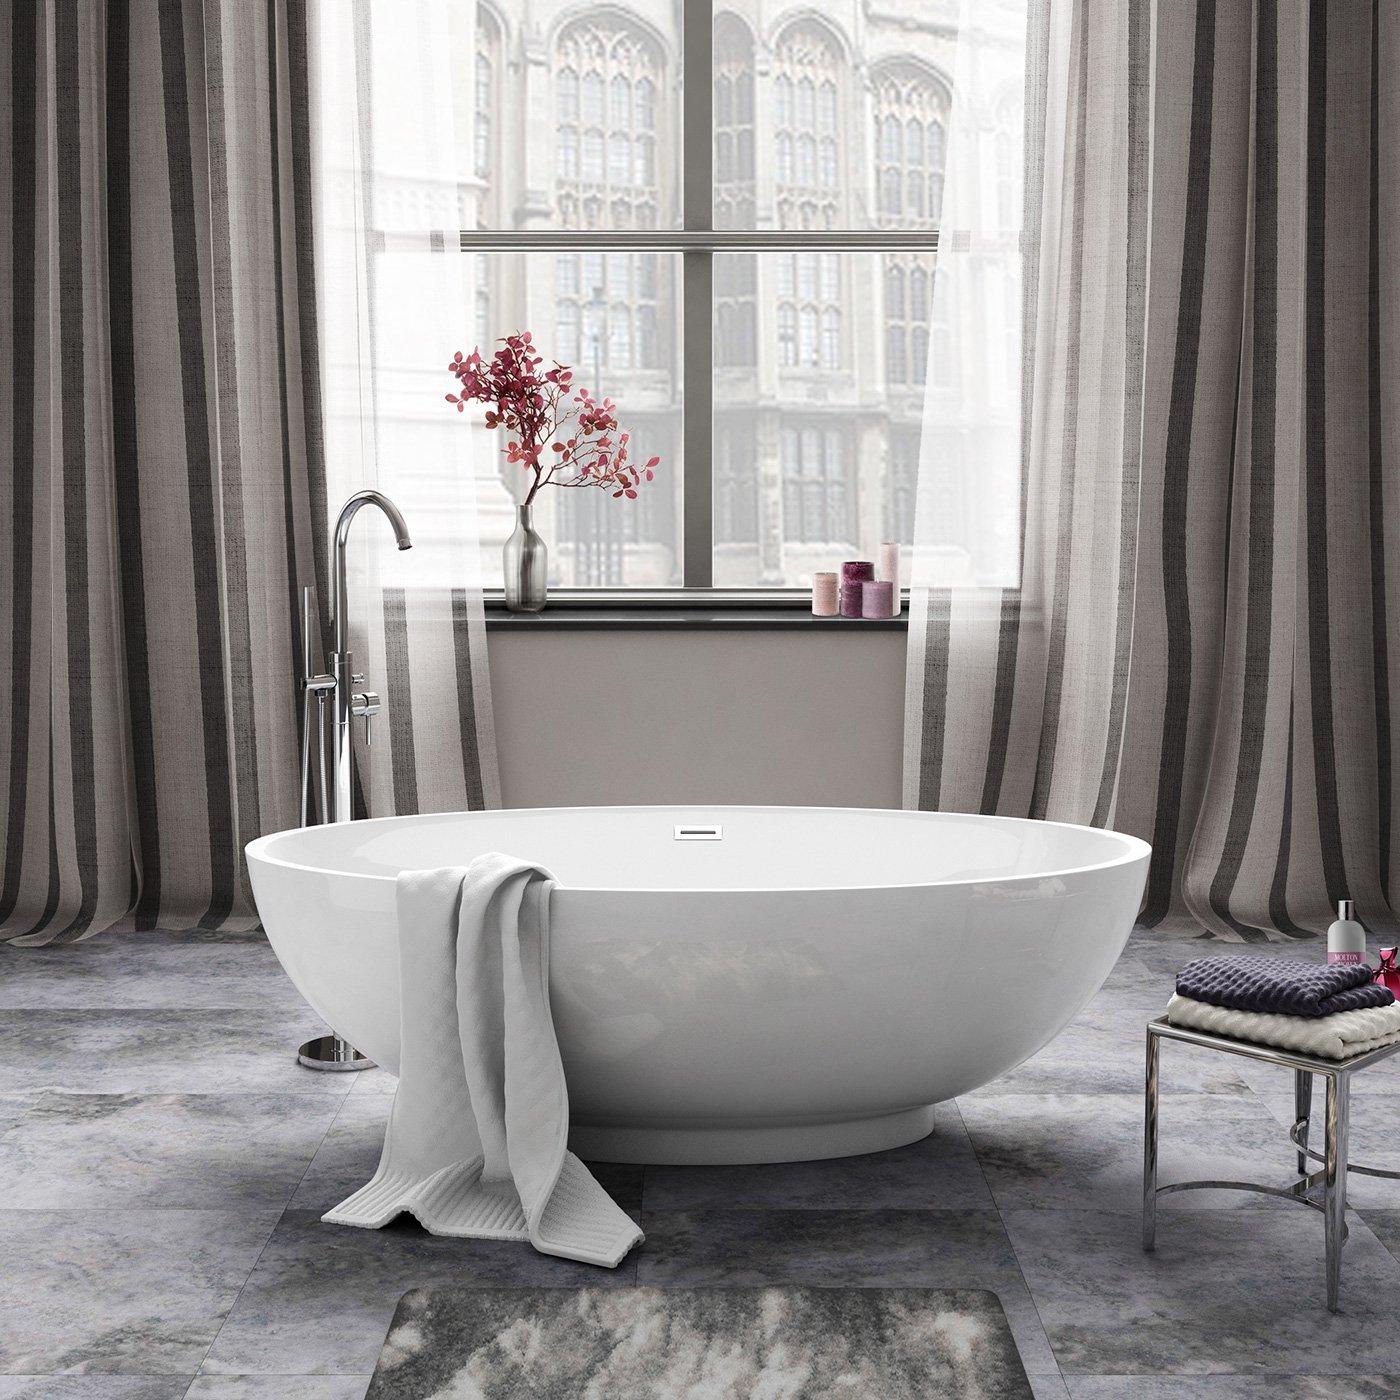 1690mm modern white designer bathroom oval freestanding bath bathtub ibathuk amazoncouk kitchen home